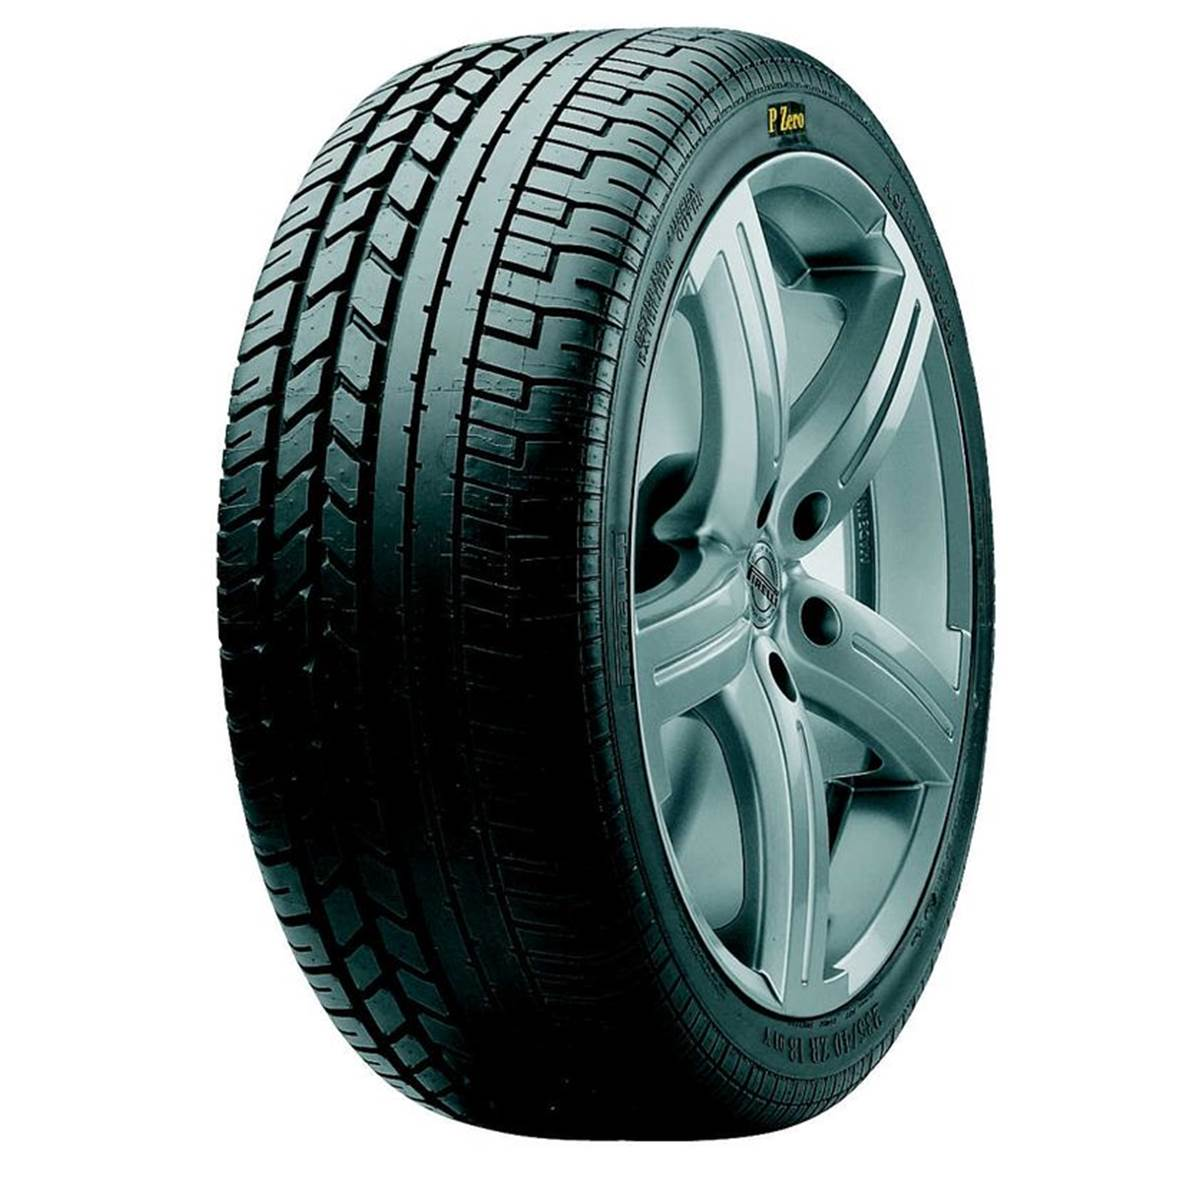 Pneu Pirelli 245/40R18 97Y Pzero Asimmetrico